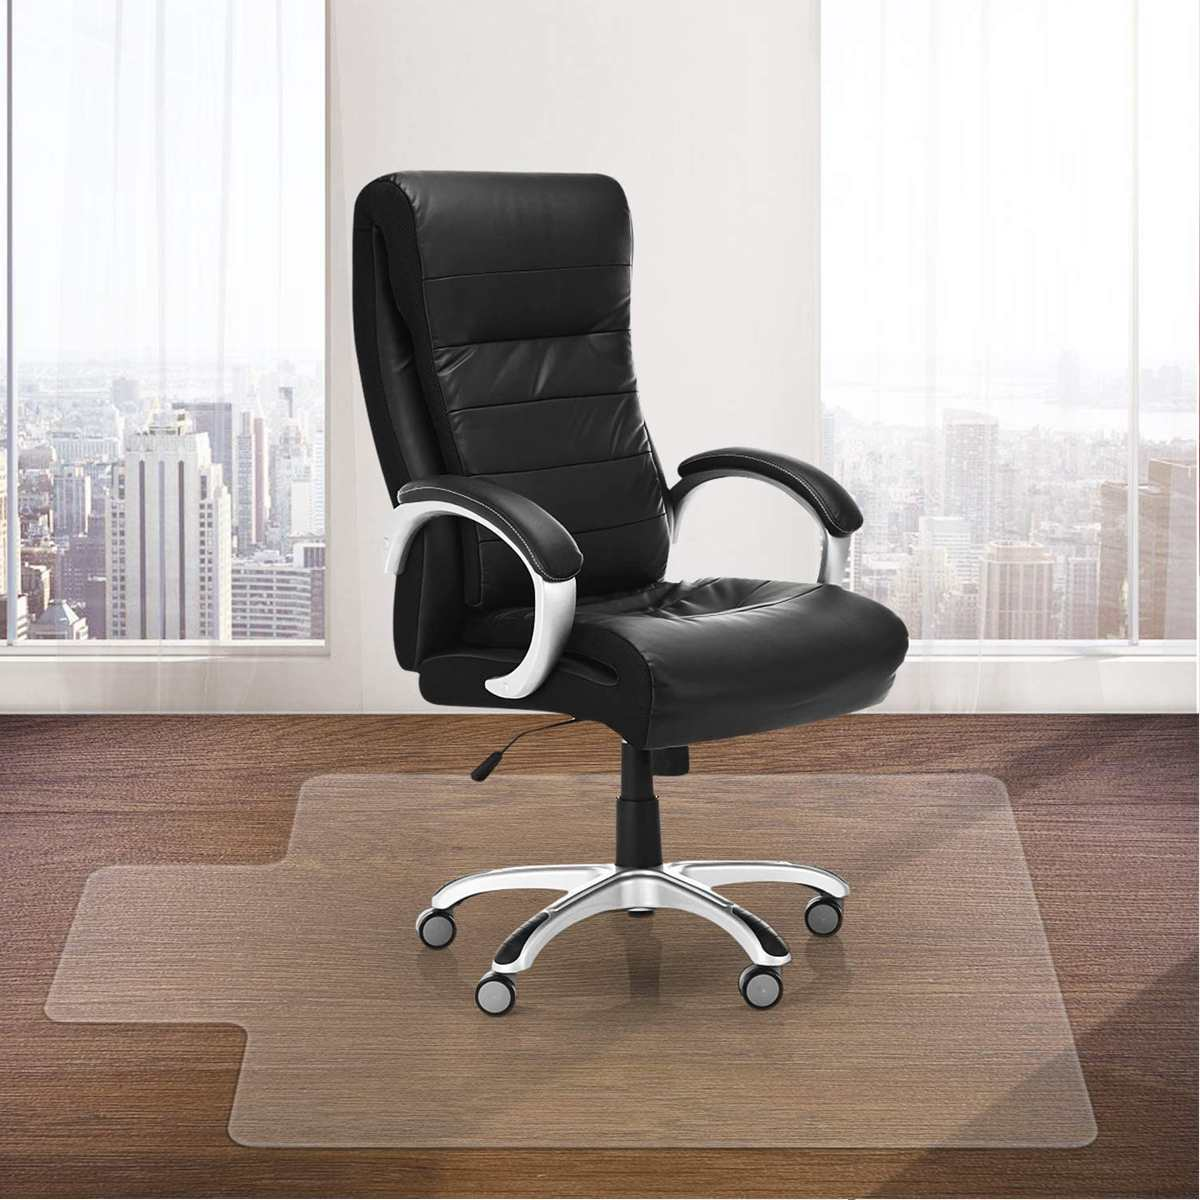 PVC Protector Clear Chair Mat Home Office Rolling Chair Floor Carpet Kitchen Mat Bath Carpet Living Room Floor Mat Without Chiar